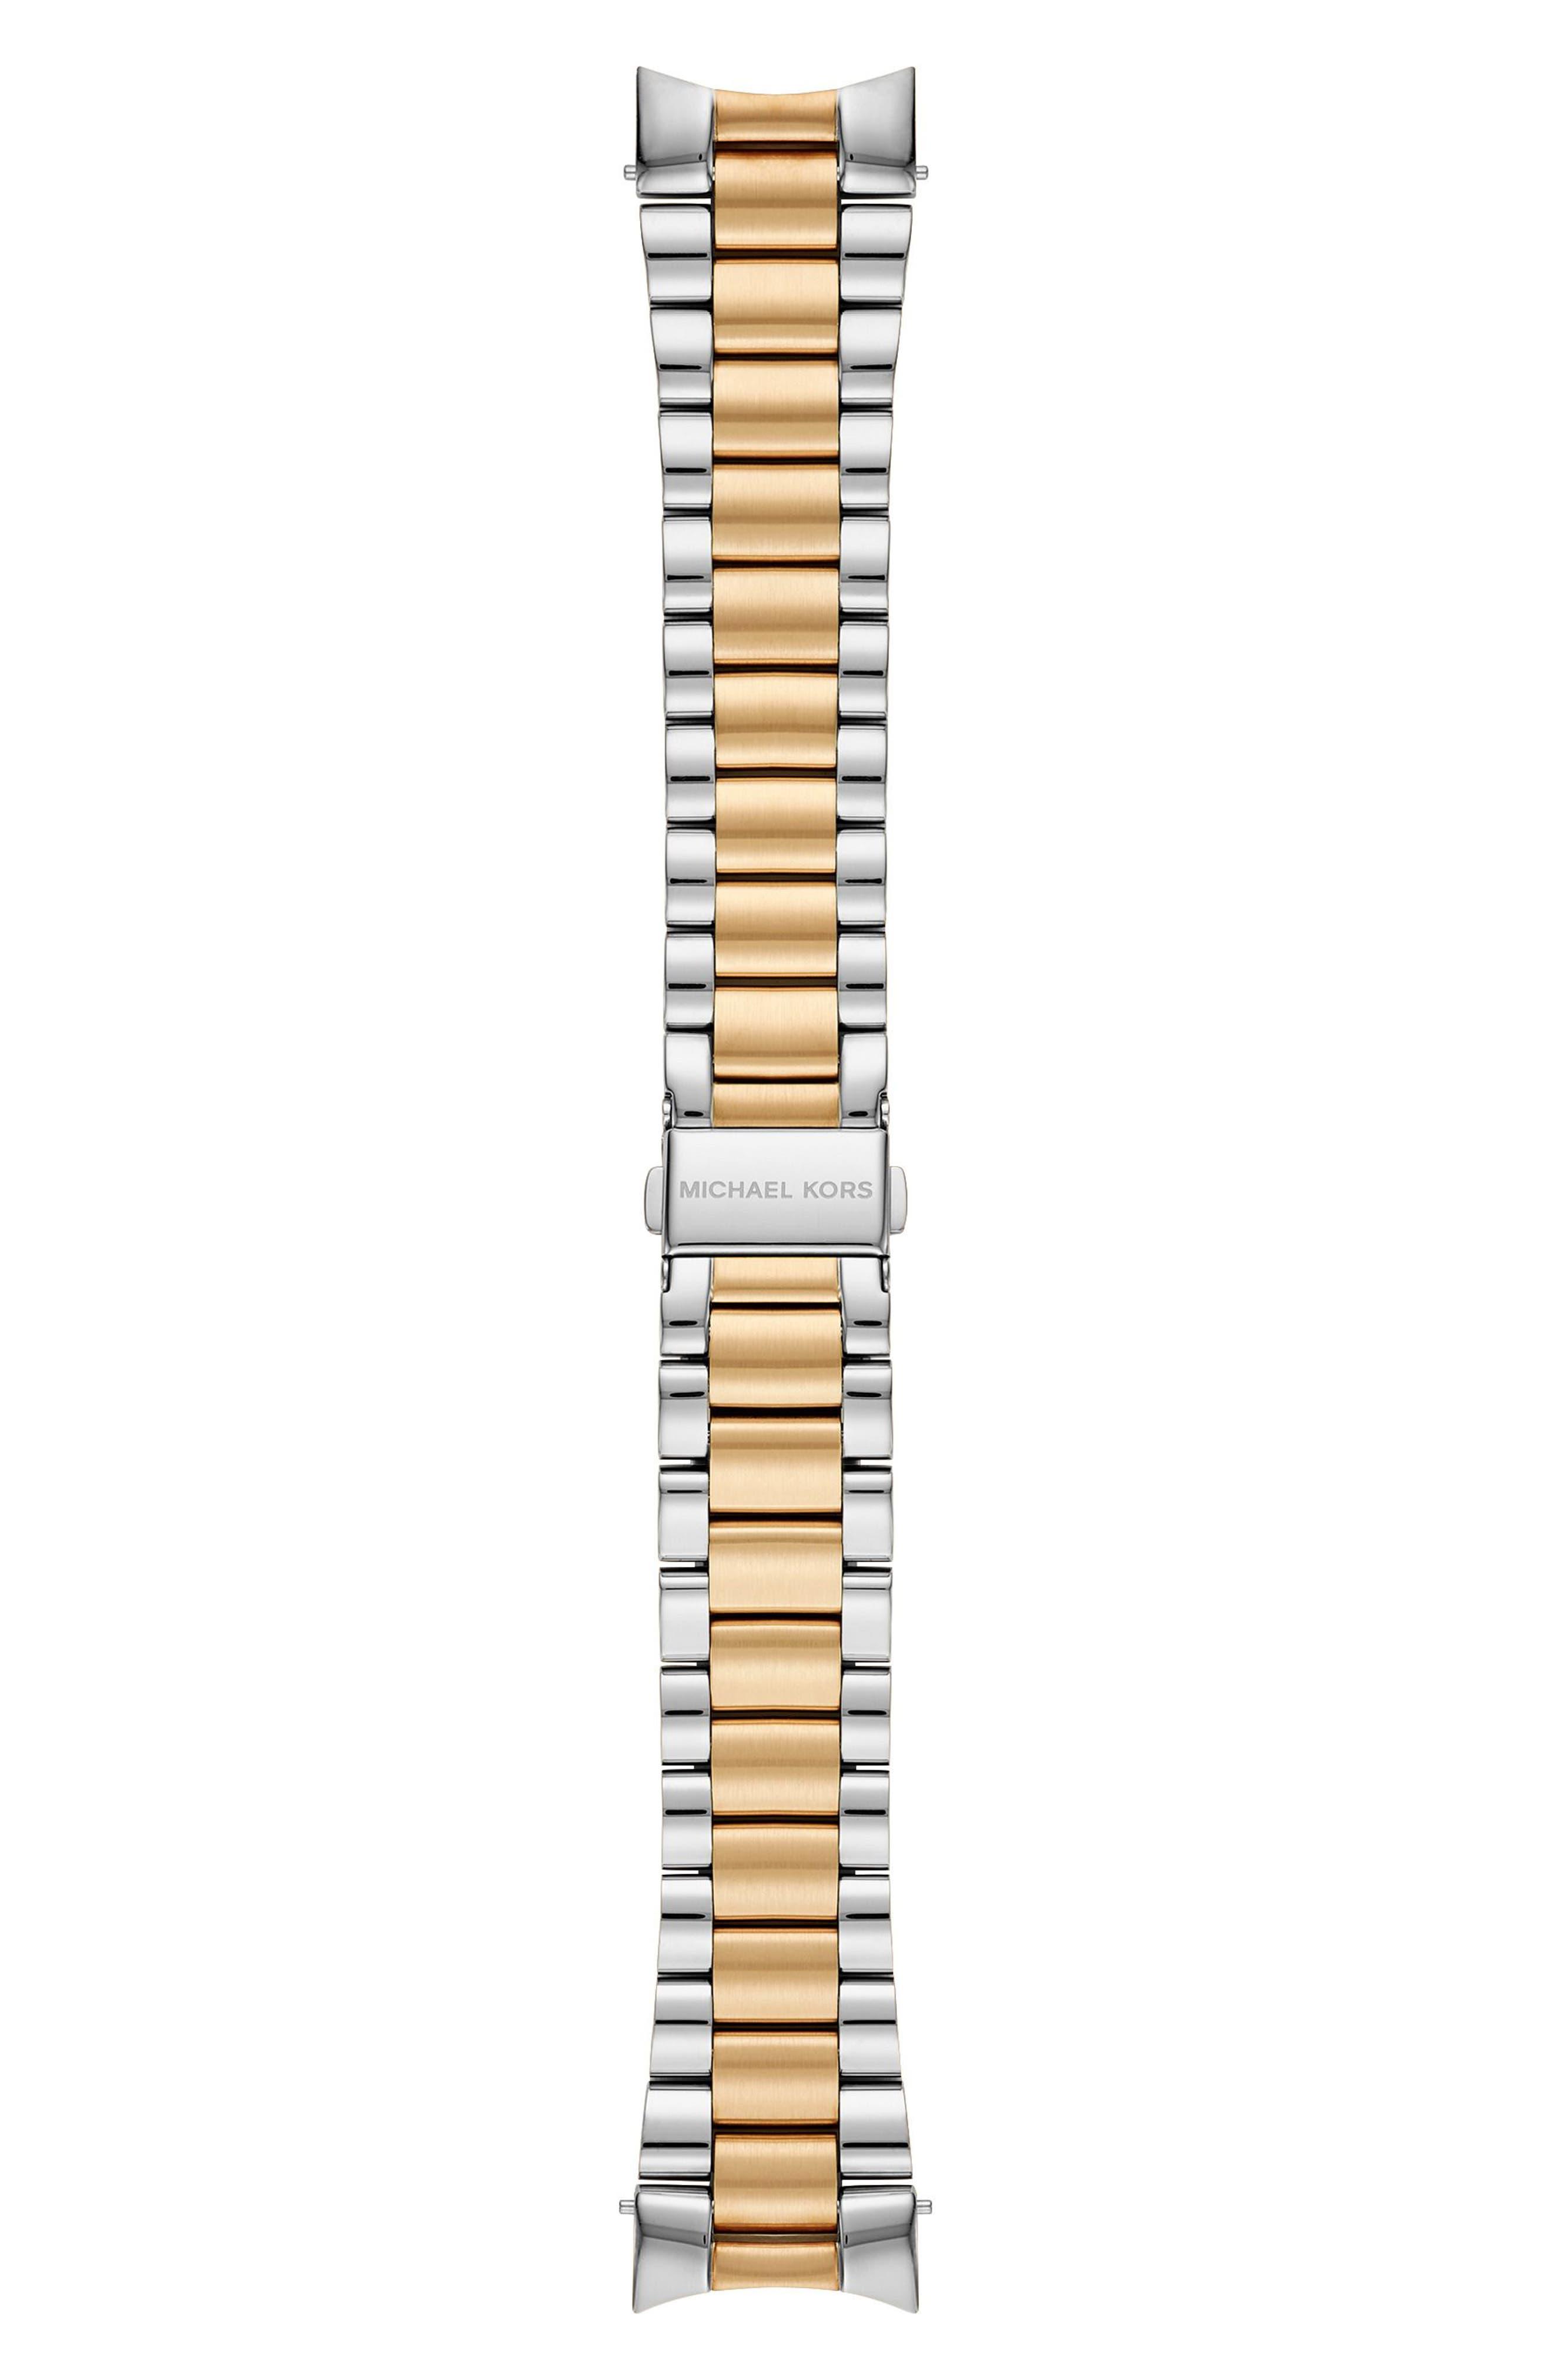 MICHAEL KORS Bradshaw Interchangeable Bracelet